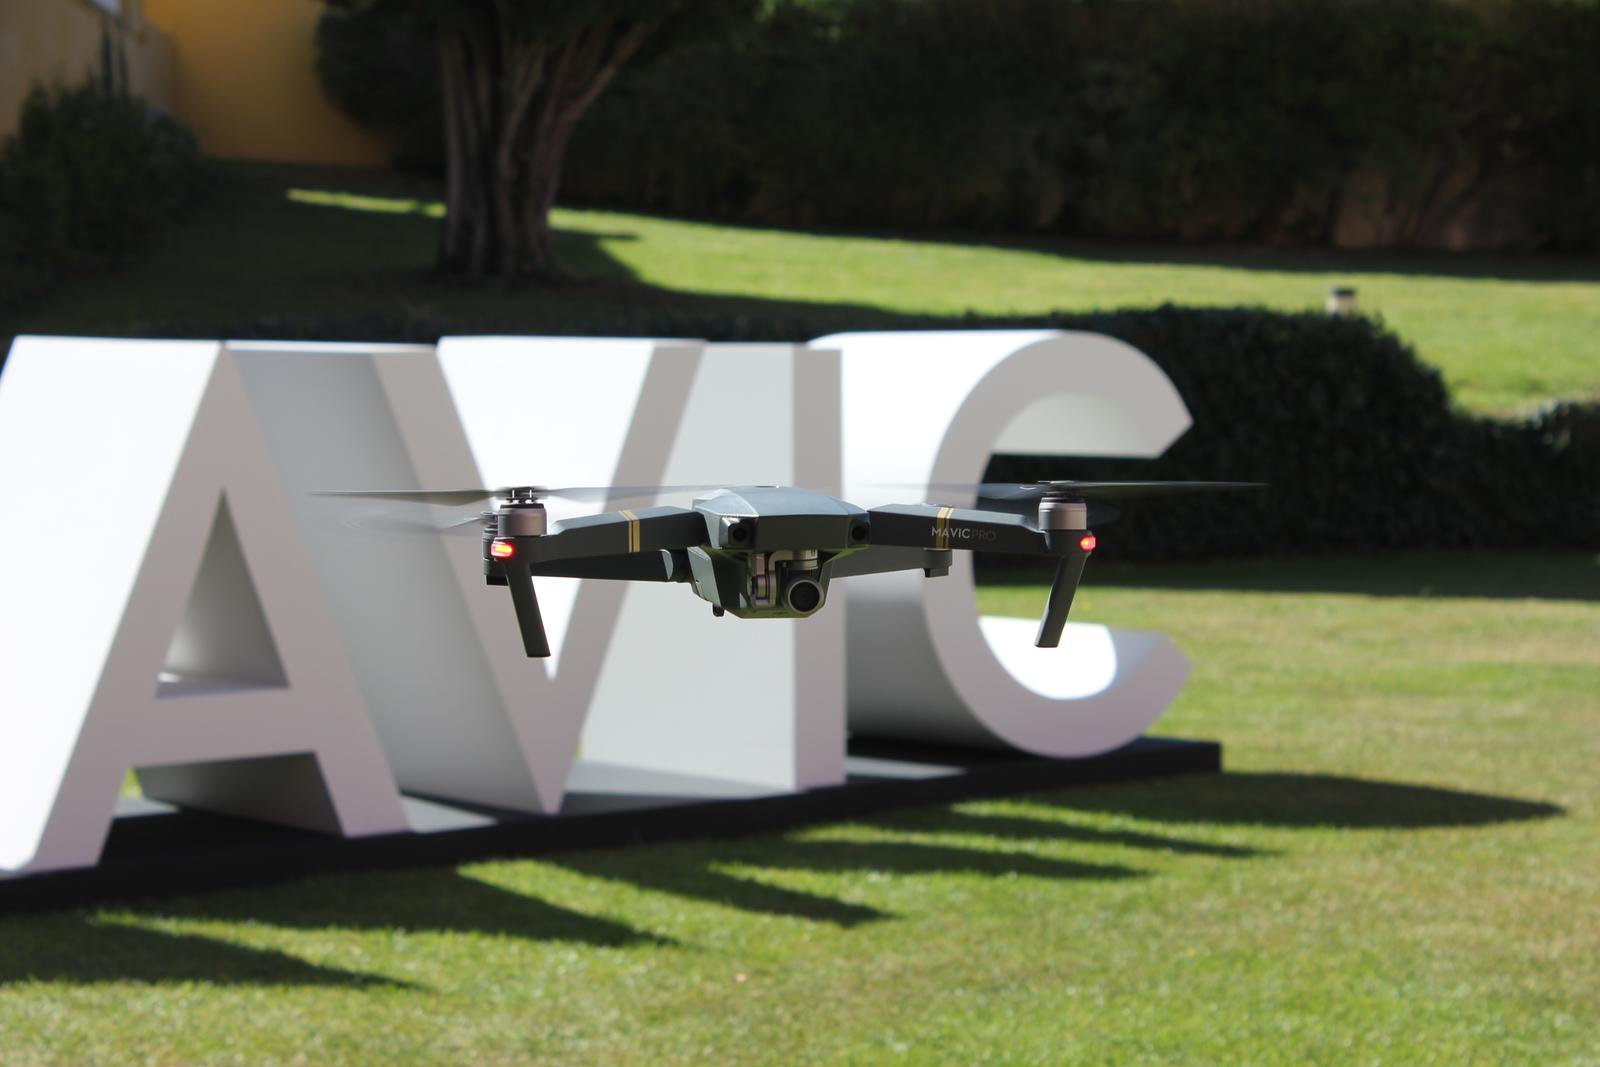 Drohnen Politik DJI Mavic Pro Drohne